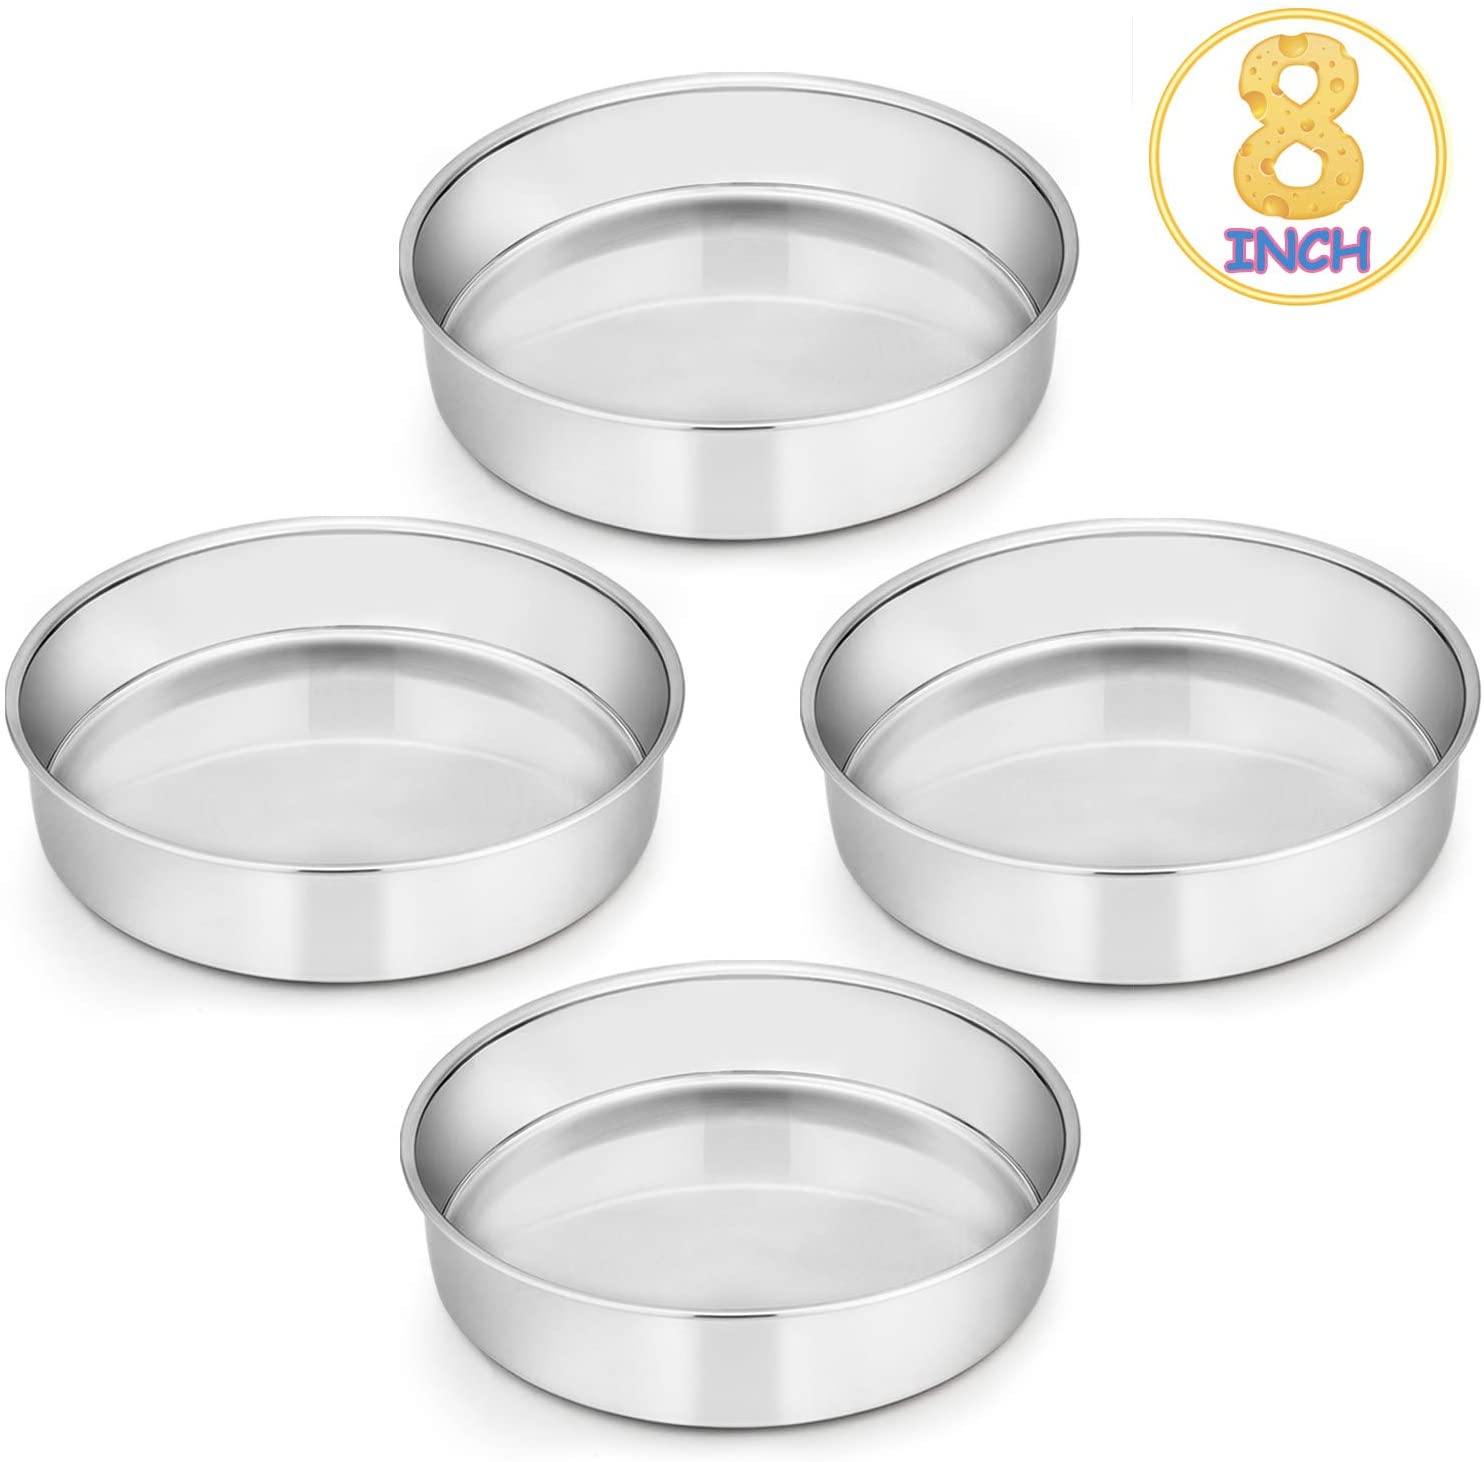 8 Inch Cake Pan Set of 4, E-far Stainless Steel Round Layer Cake Baking Pans, Non-Toxic & Healthy, Mirror Finish & Dishwasher Safe